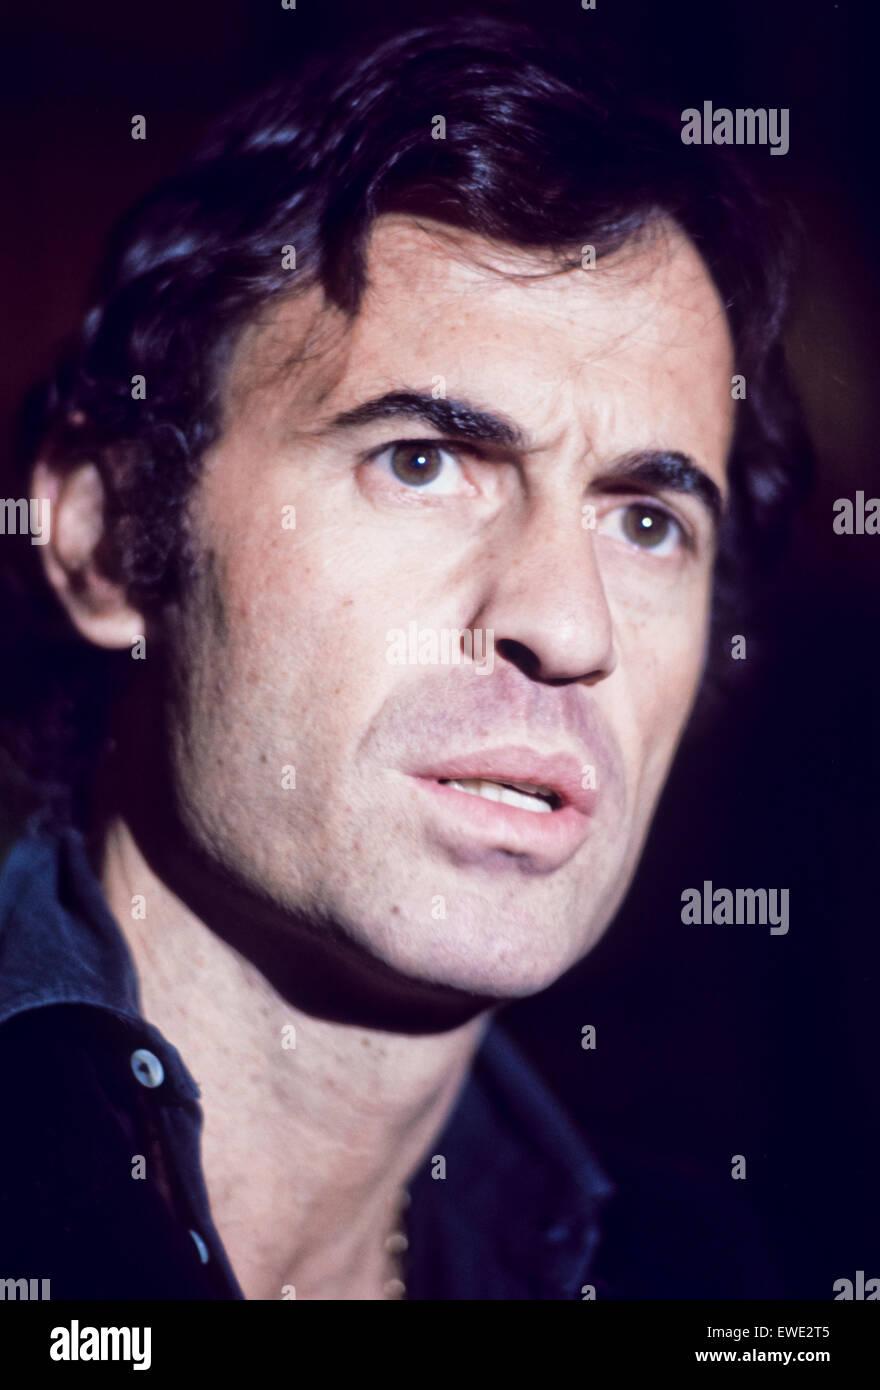 Franco Califano Stock Photo - Alamy